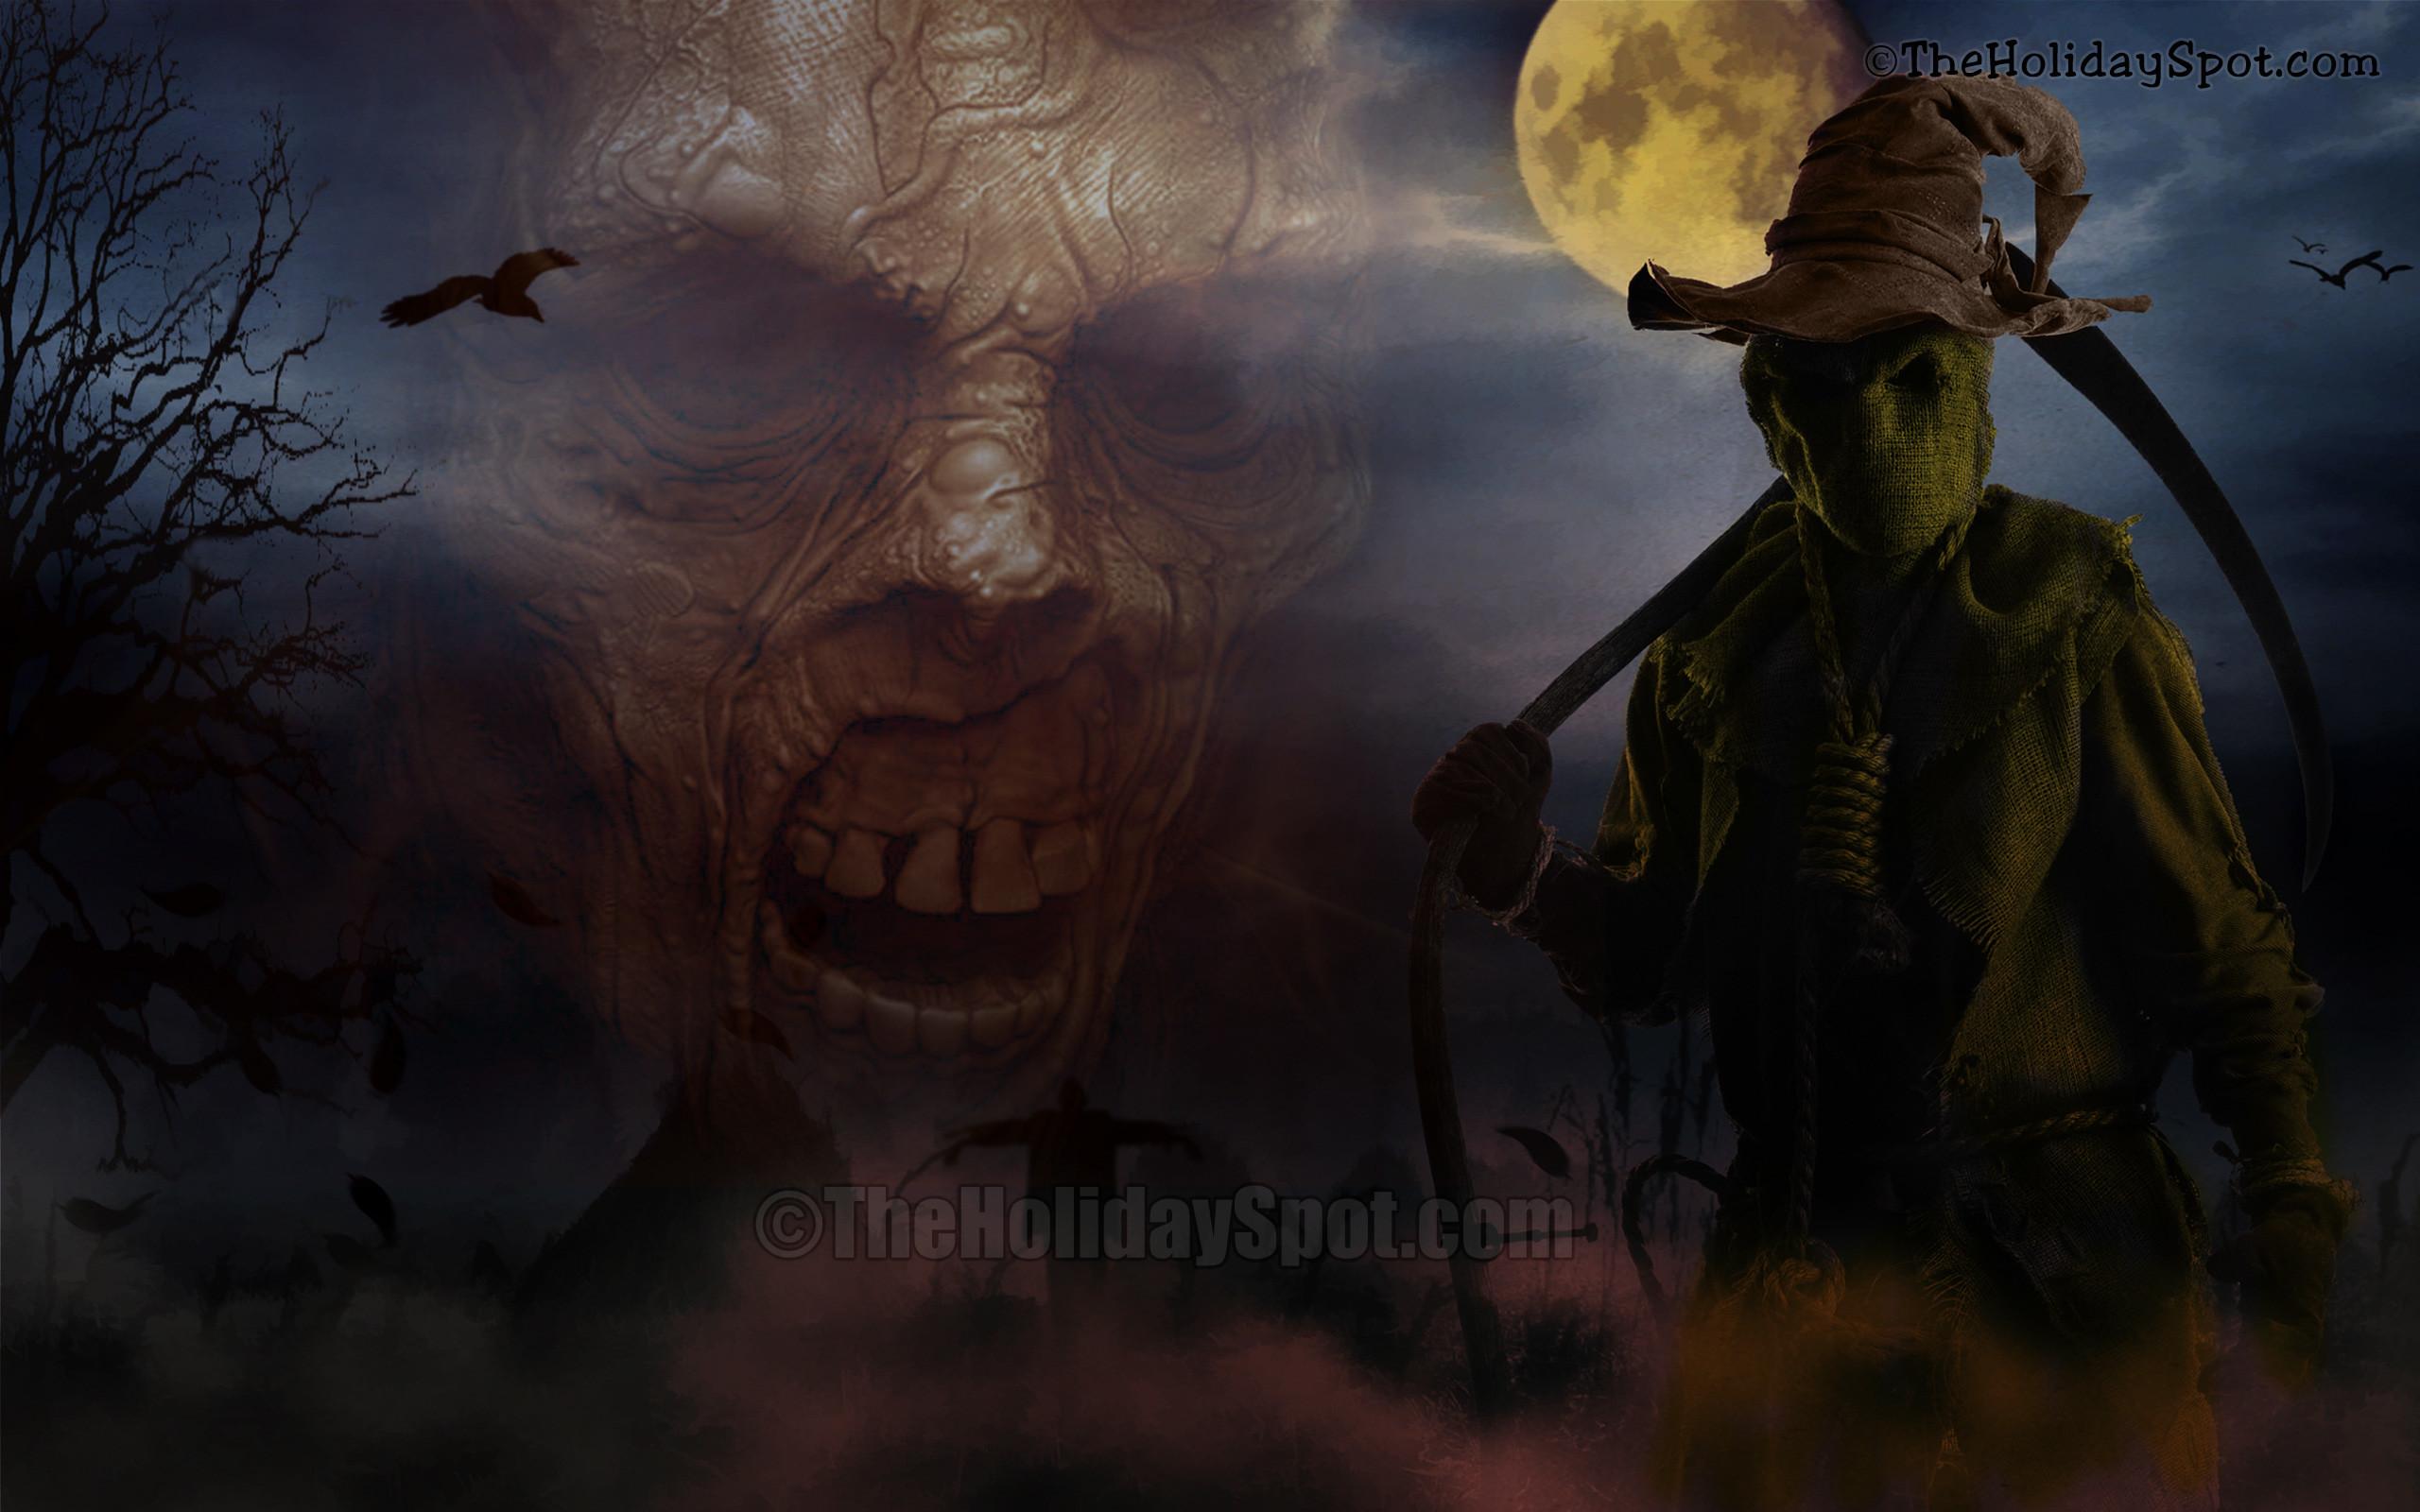 Wallpaper – Demons at Halloween Night